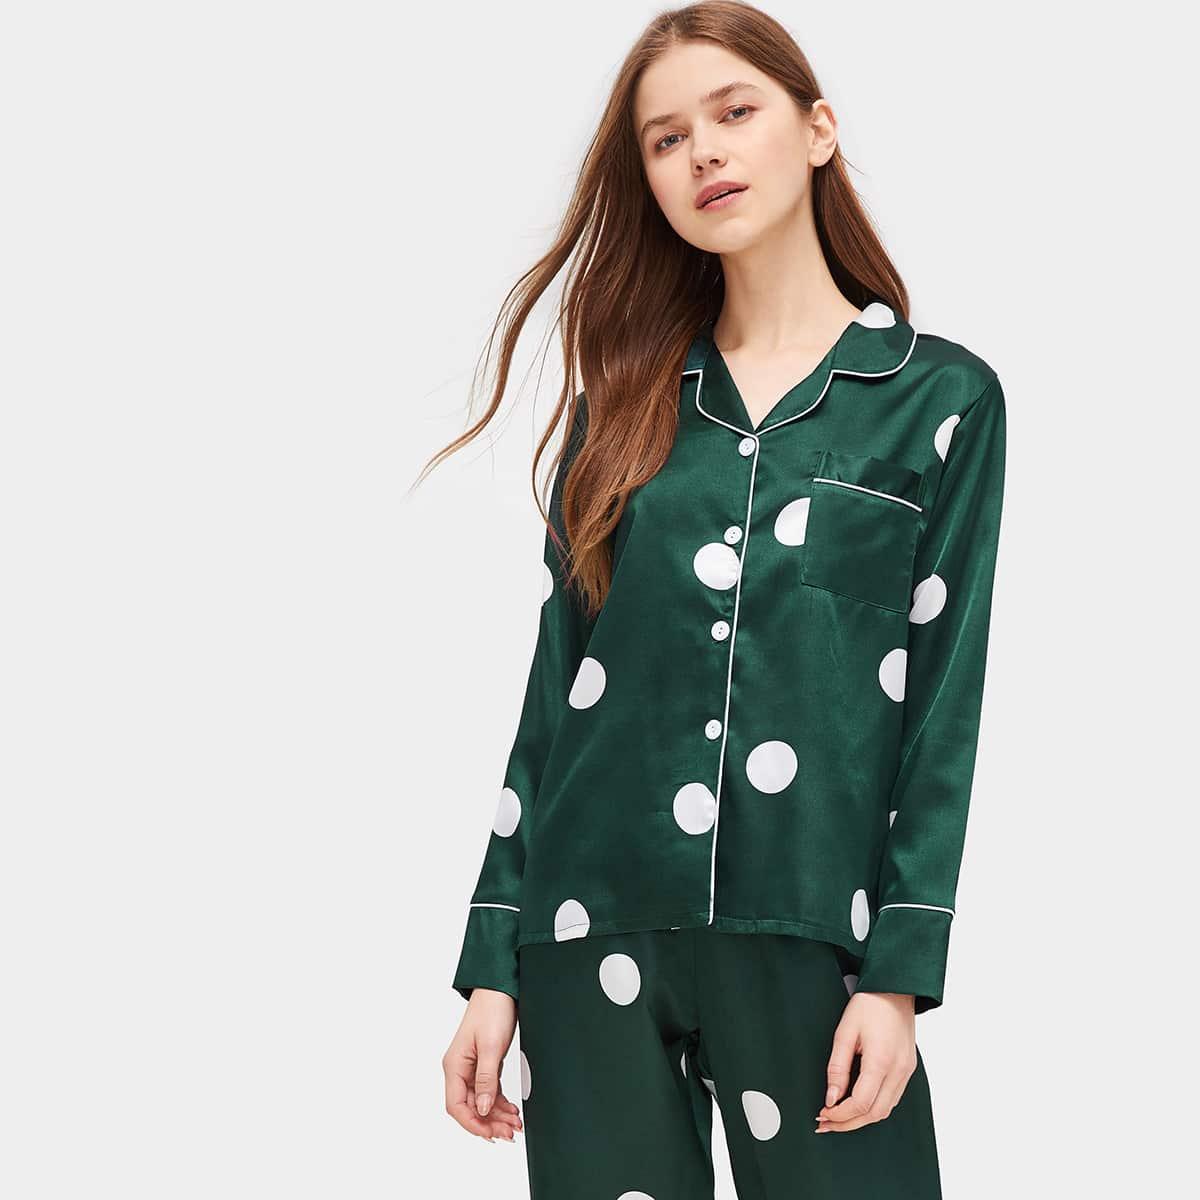 Groen Elegant Stippen Lounge kleding Knoop